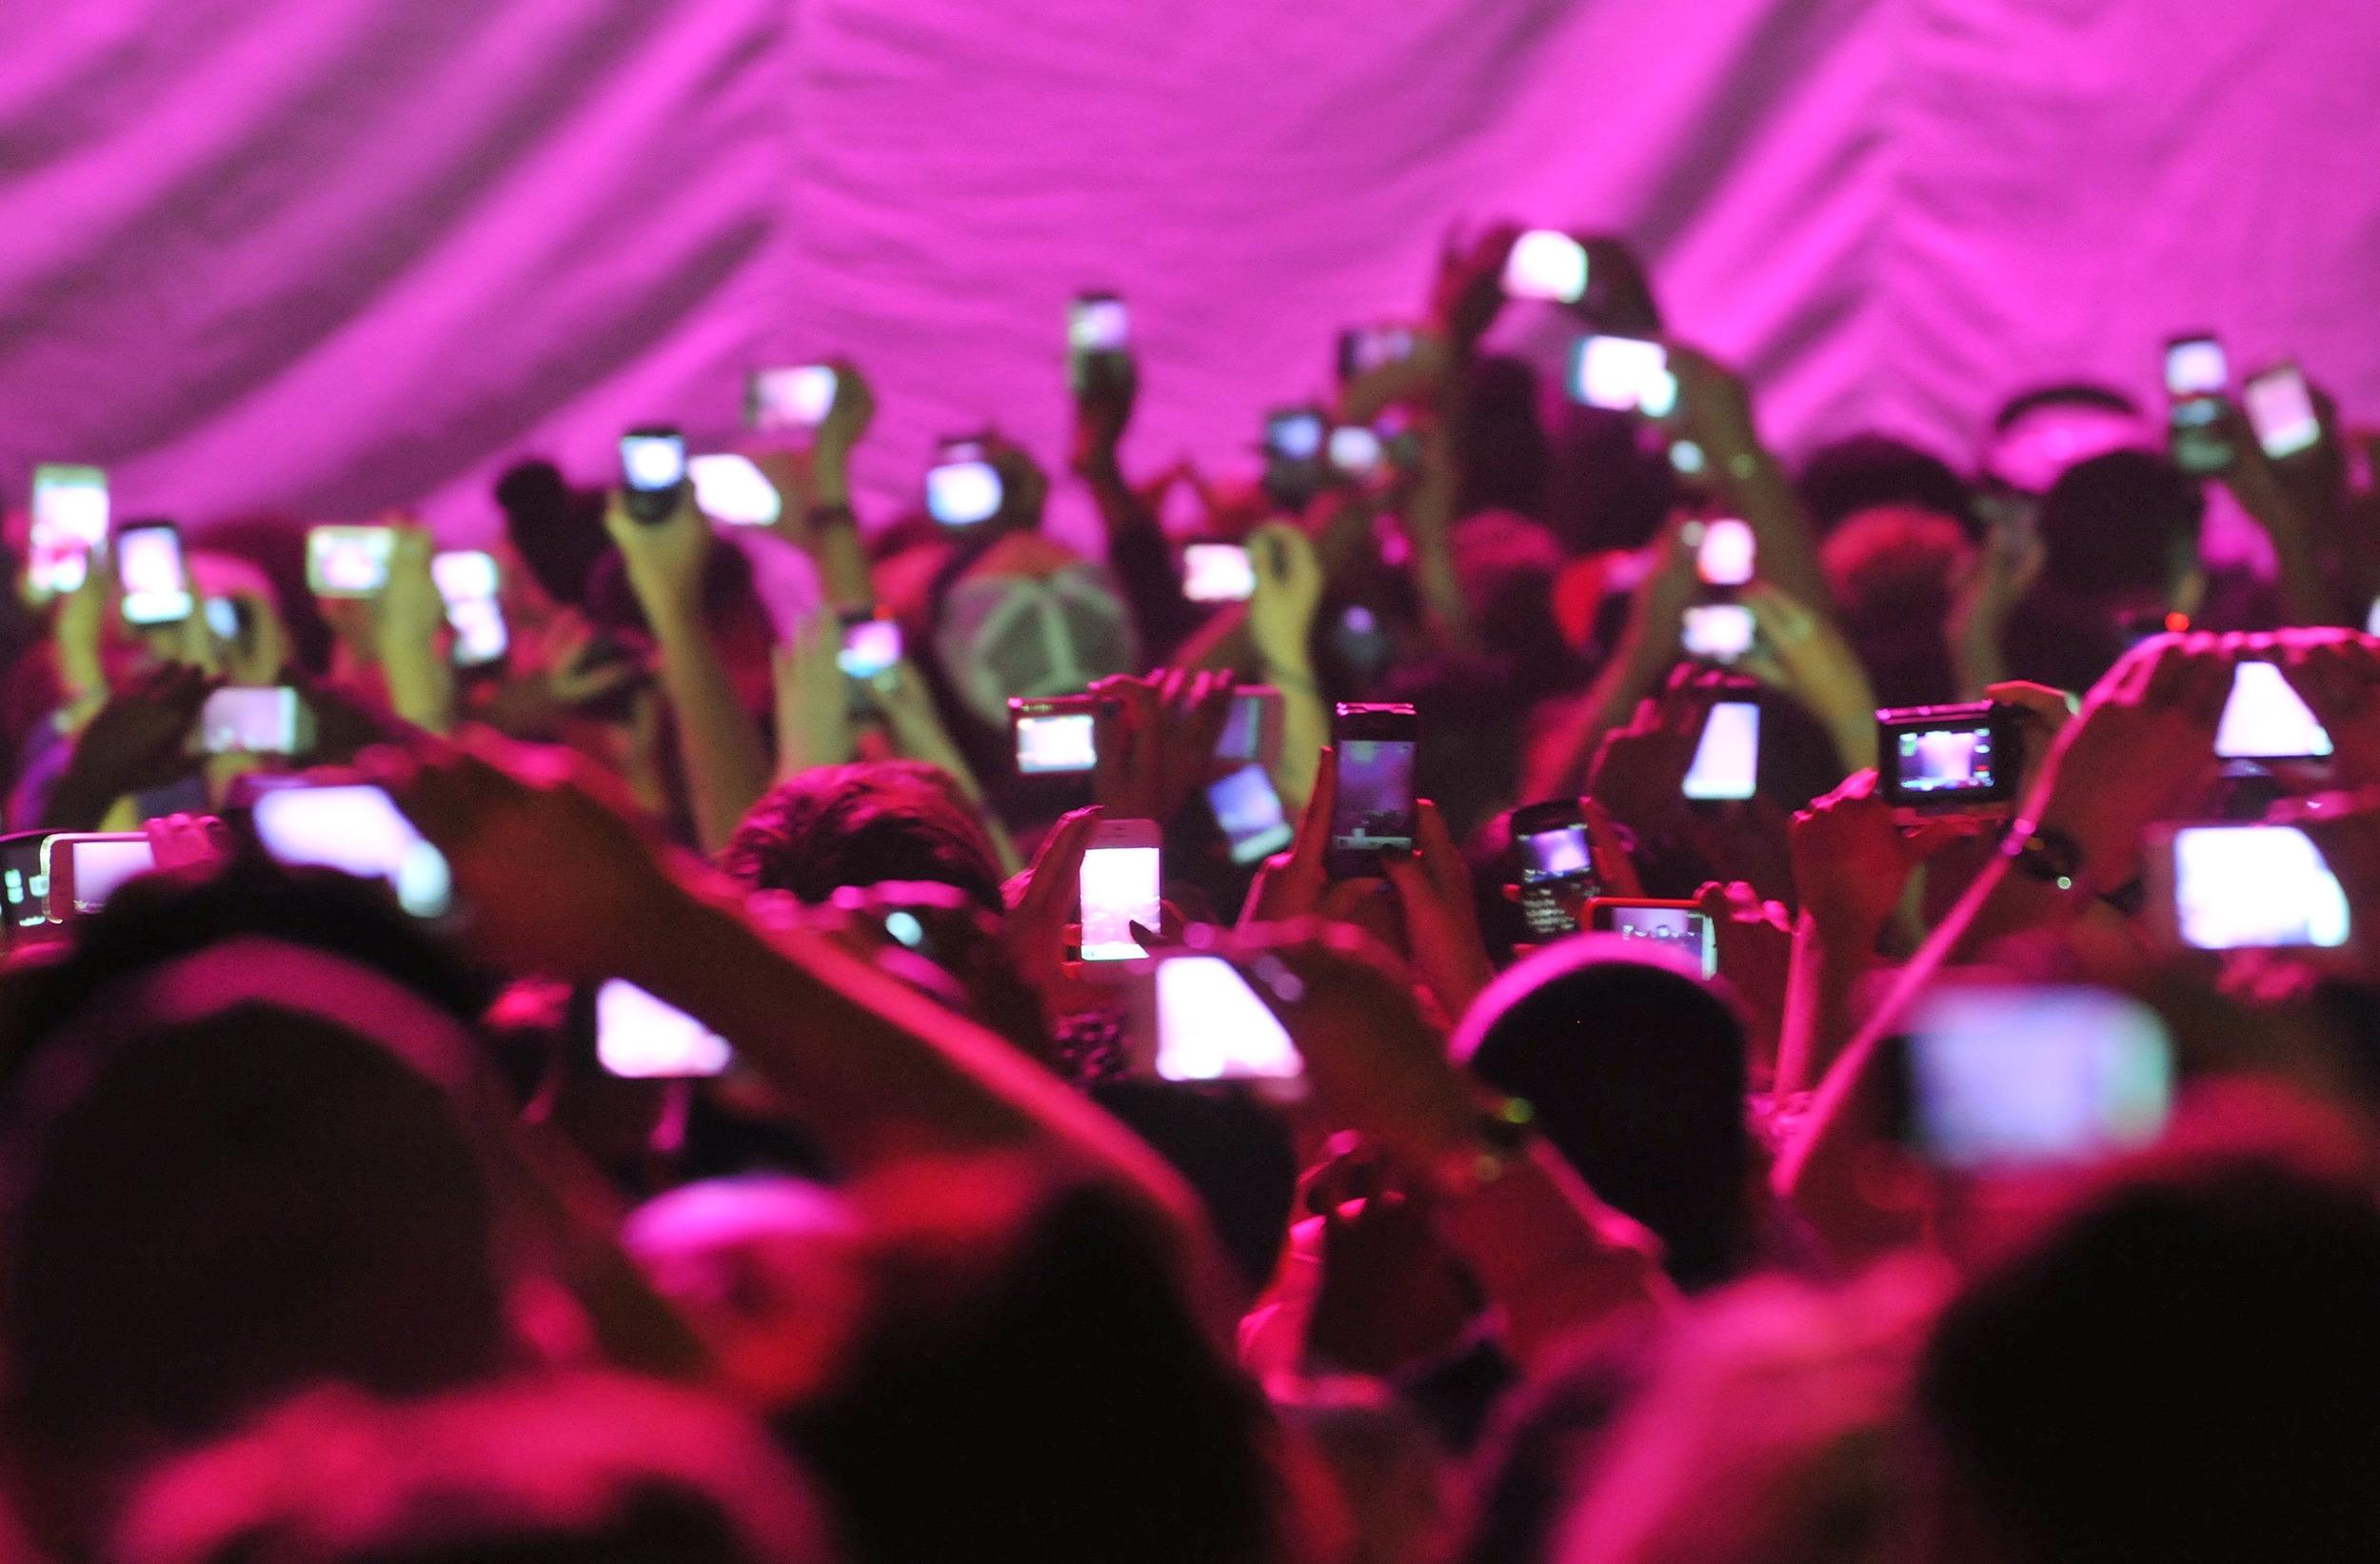 160628-phones-concert-ef-1343_619b6efdfb050696ee7e953a2faf1eef[1].jpg